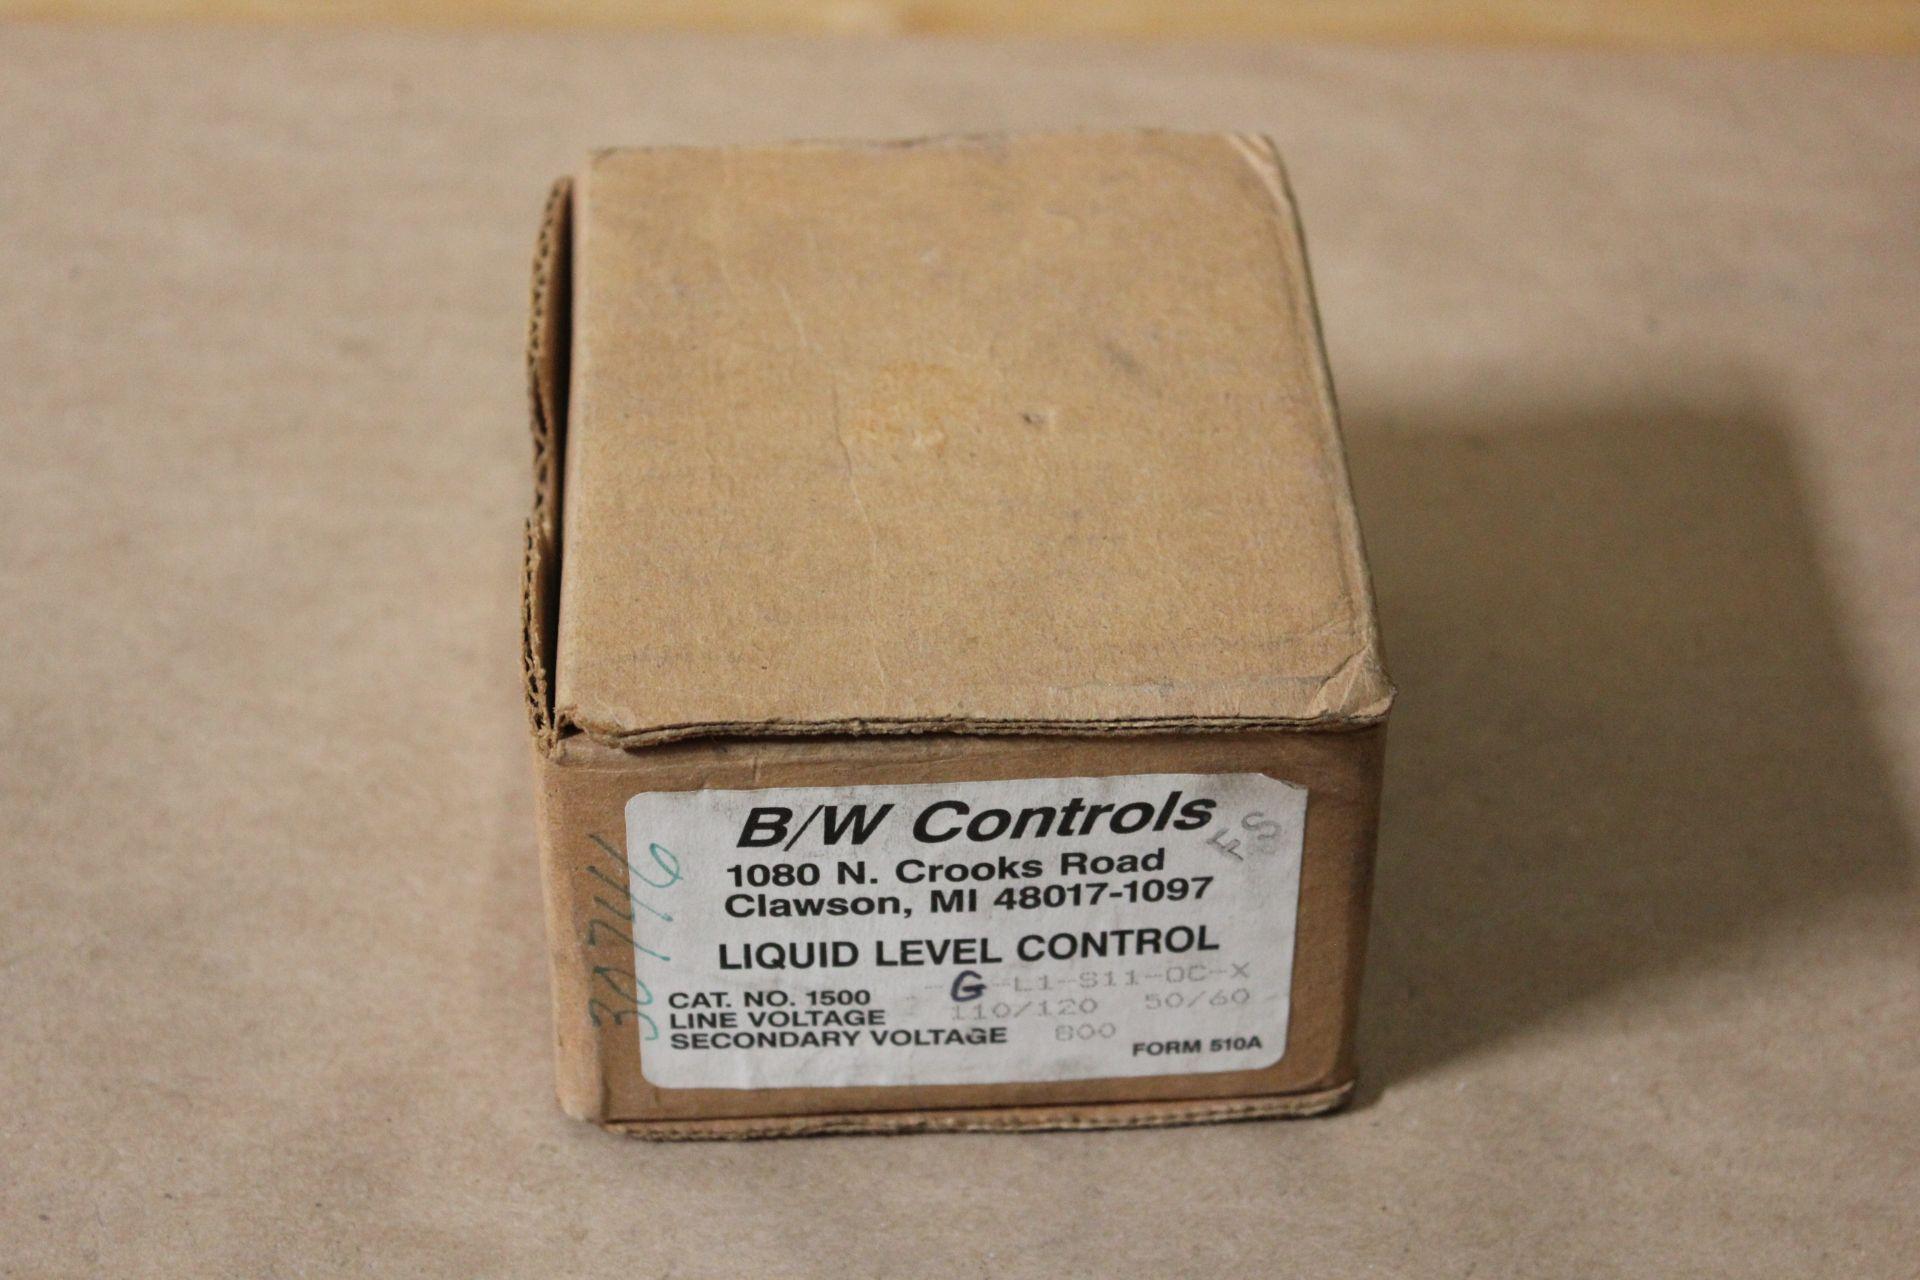 NEW B/W CONTROLS LIQUID LEVEL CONTROL